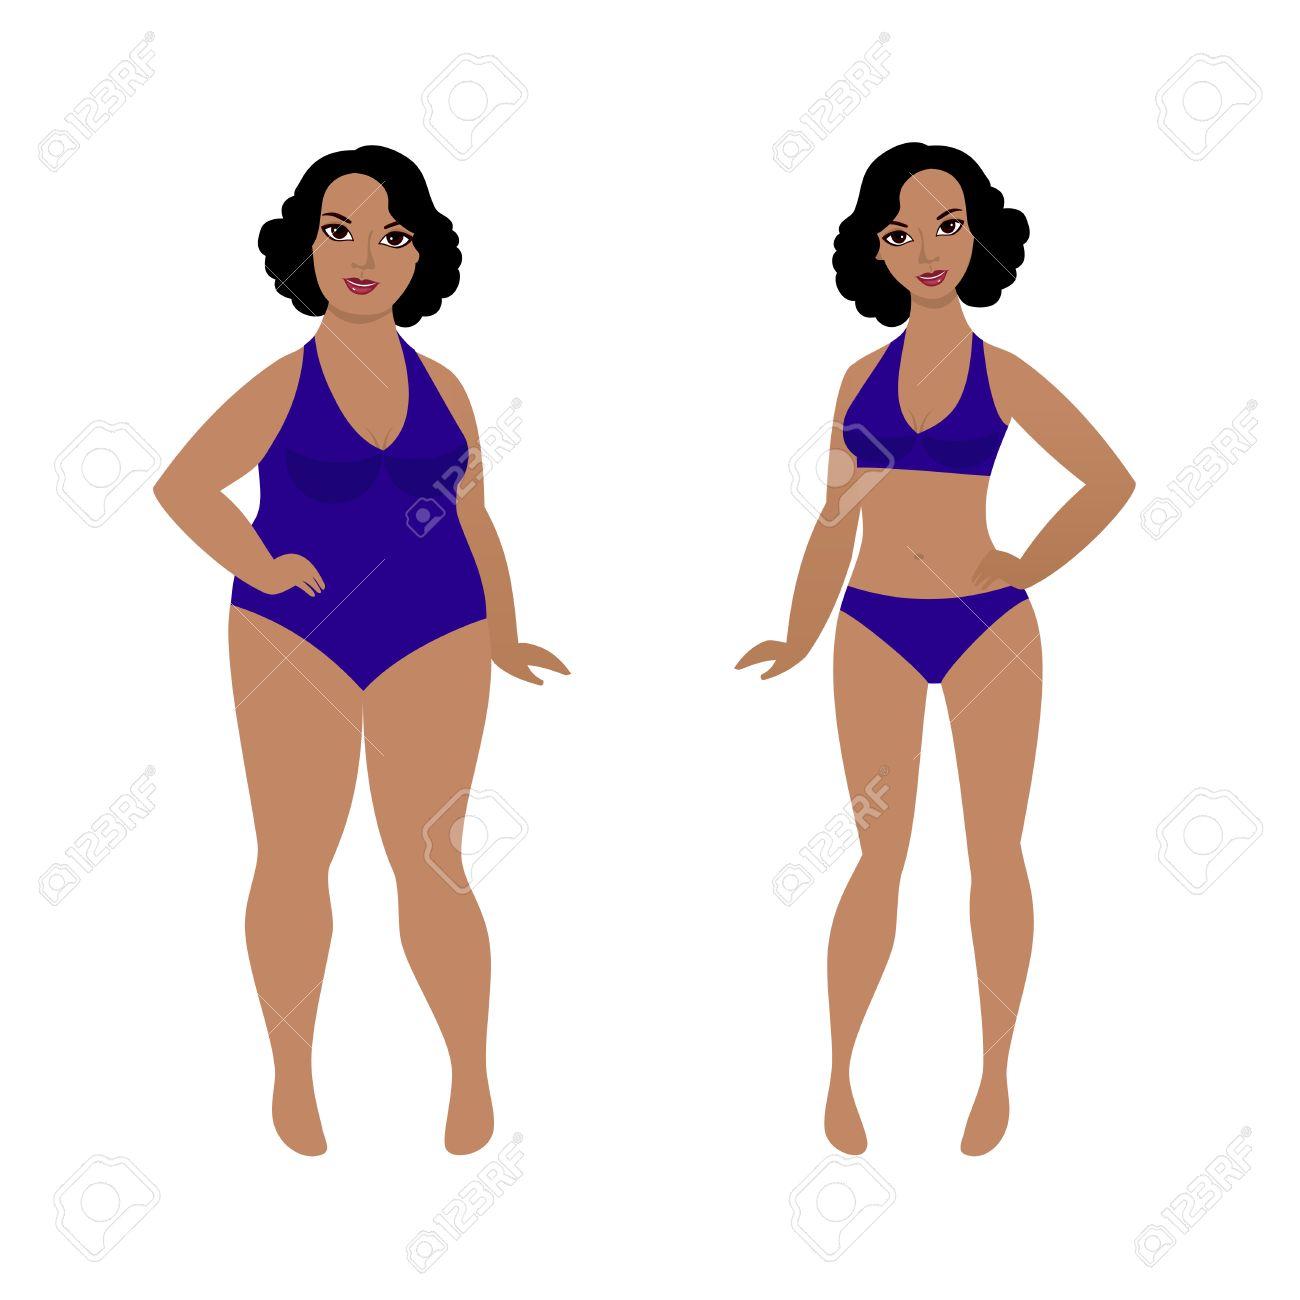 Mujer adelgazar